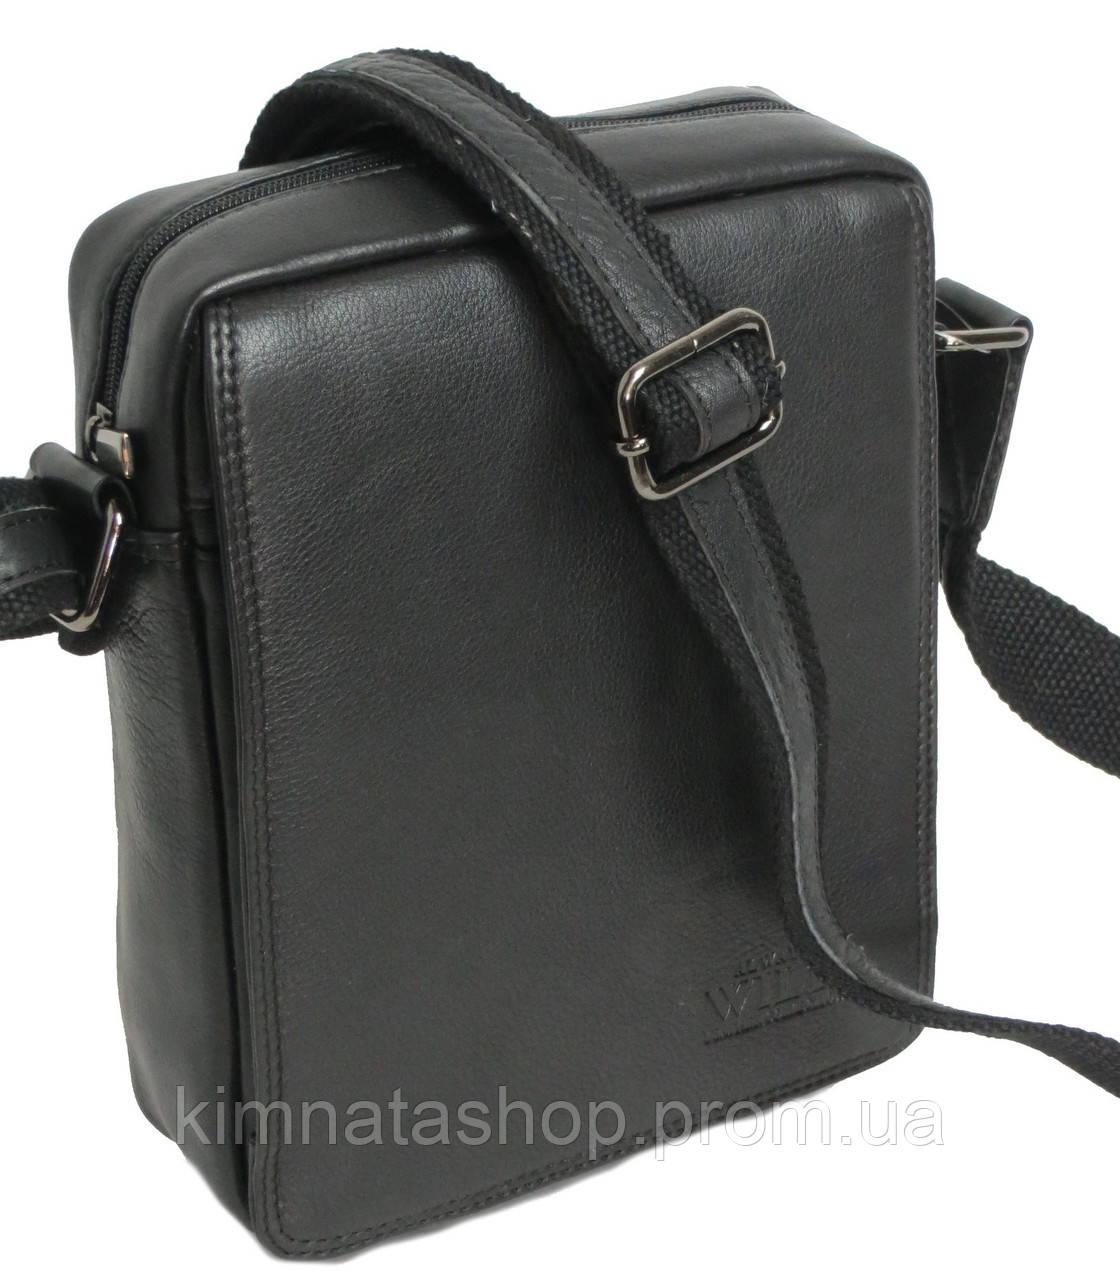 24a6b954bea9 Стильная мужская сумка-планшетка из натуральной кожи Always Wild 771 NDM  черная 18х24х8 см.